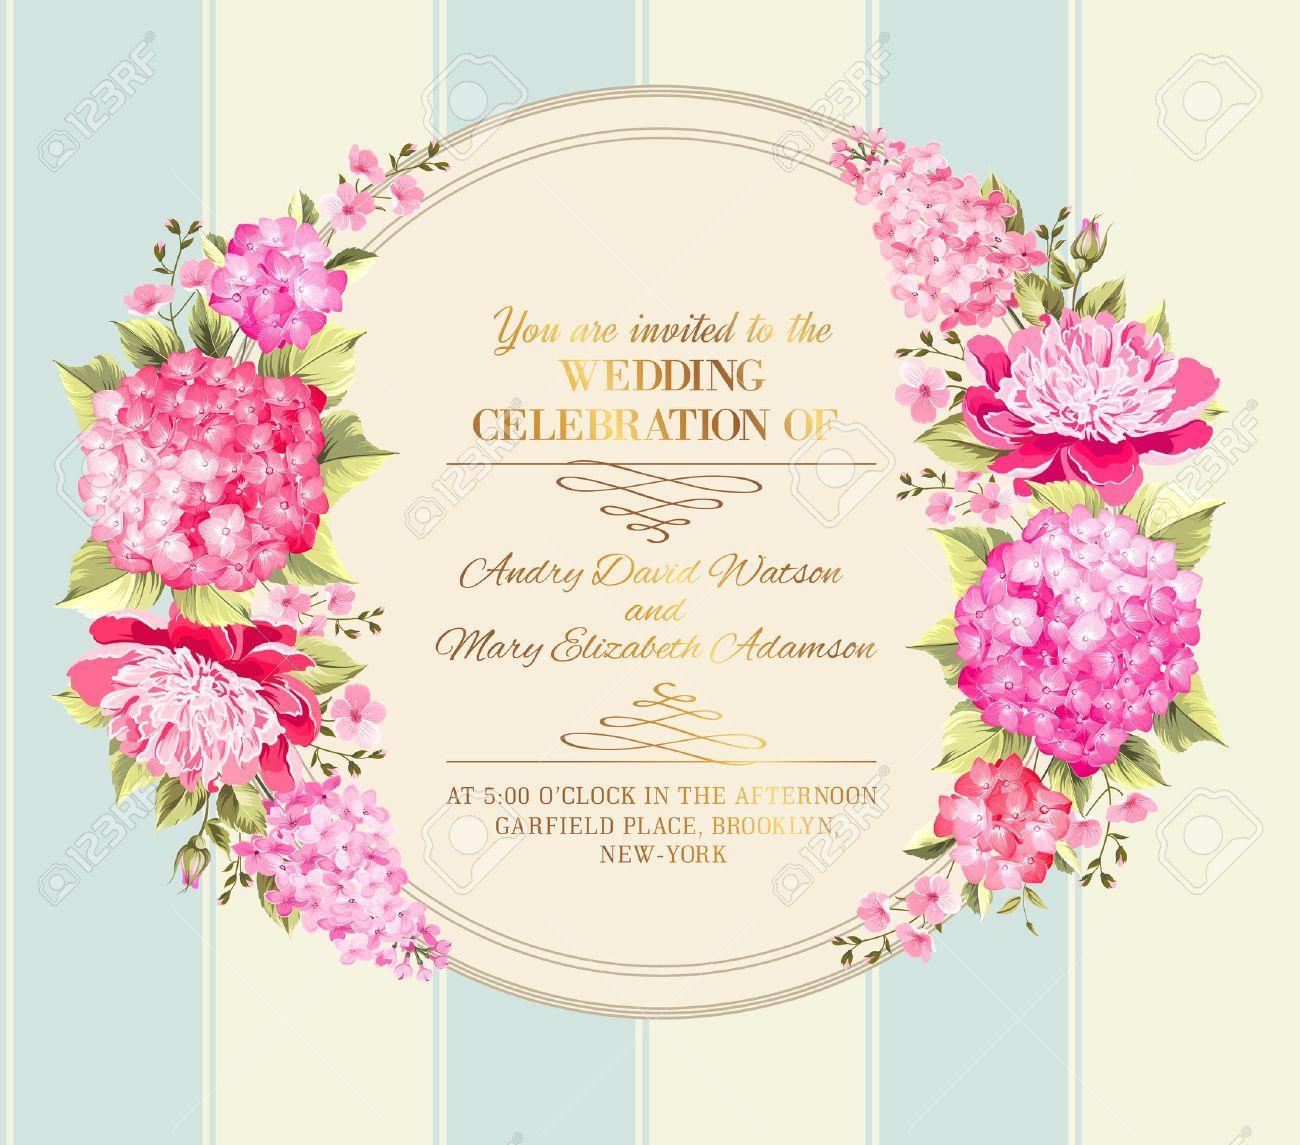 Wedding Invitation Postcards Templates Wedding Invitation Cards – Engagement Invitation Cards Templates